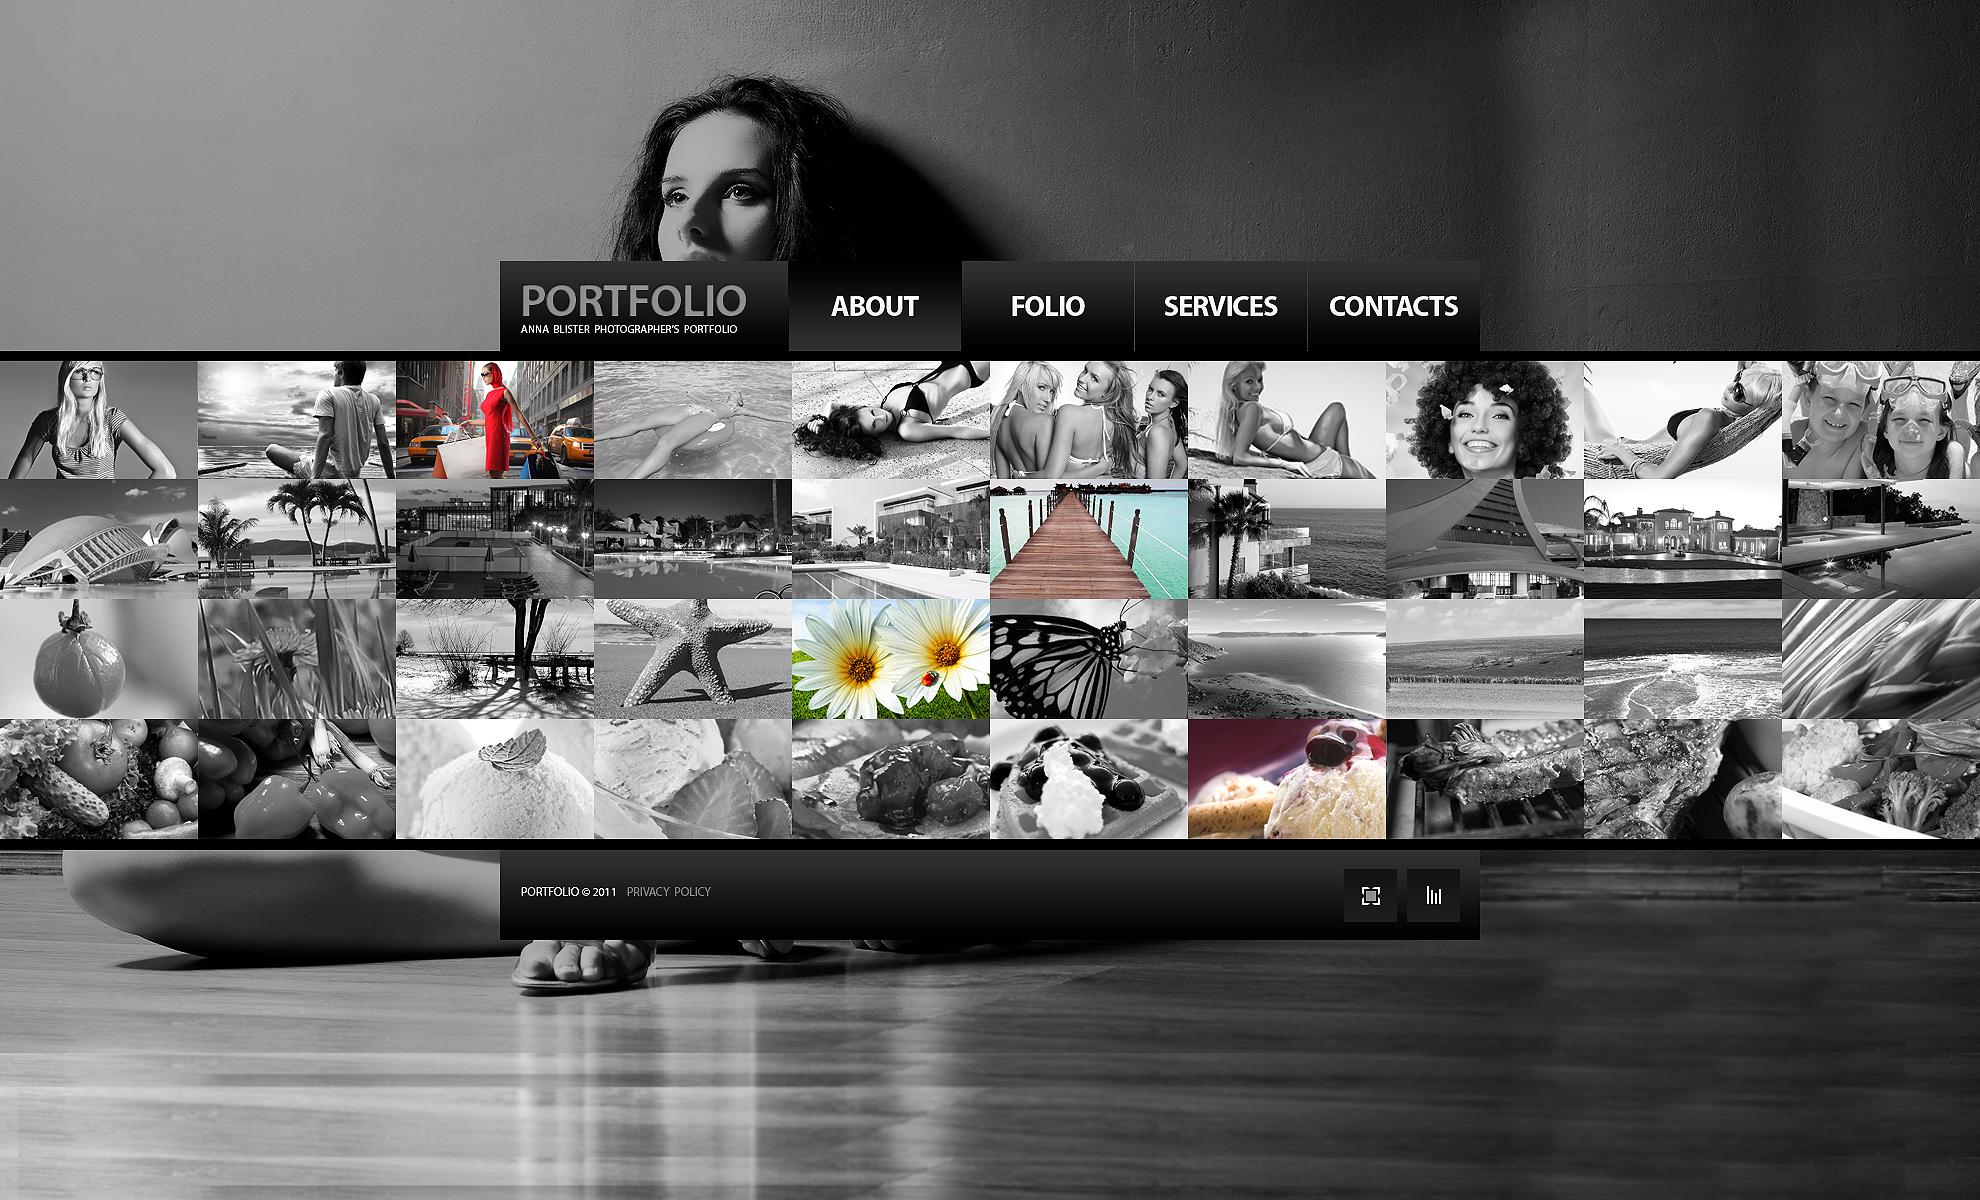 Plantilla Para Galería De Fotos #33955 para Sitio de Portafolios de fotógrafos - captura de pantalla